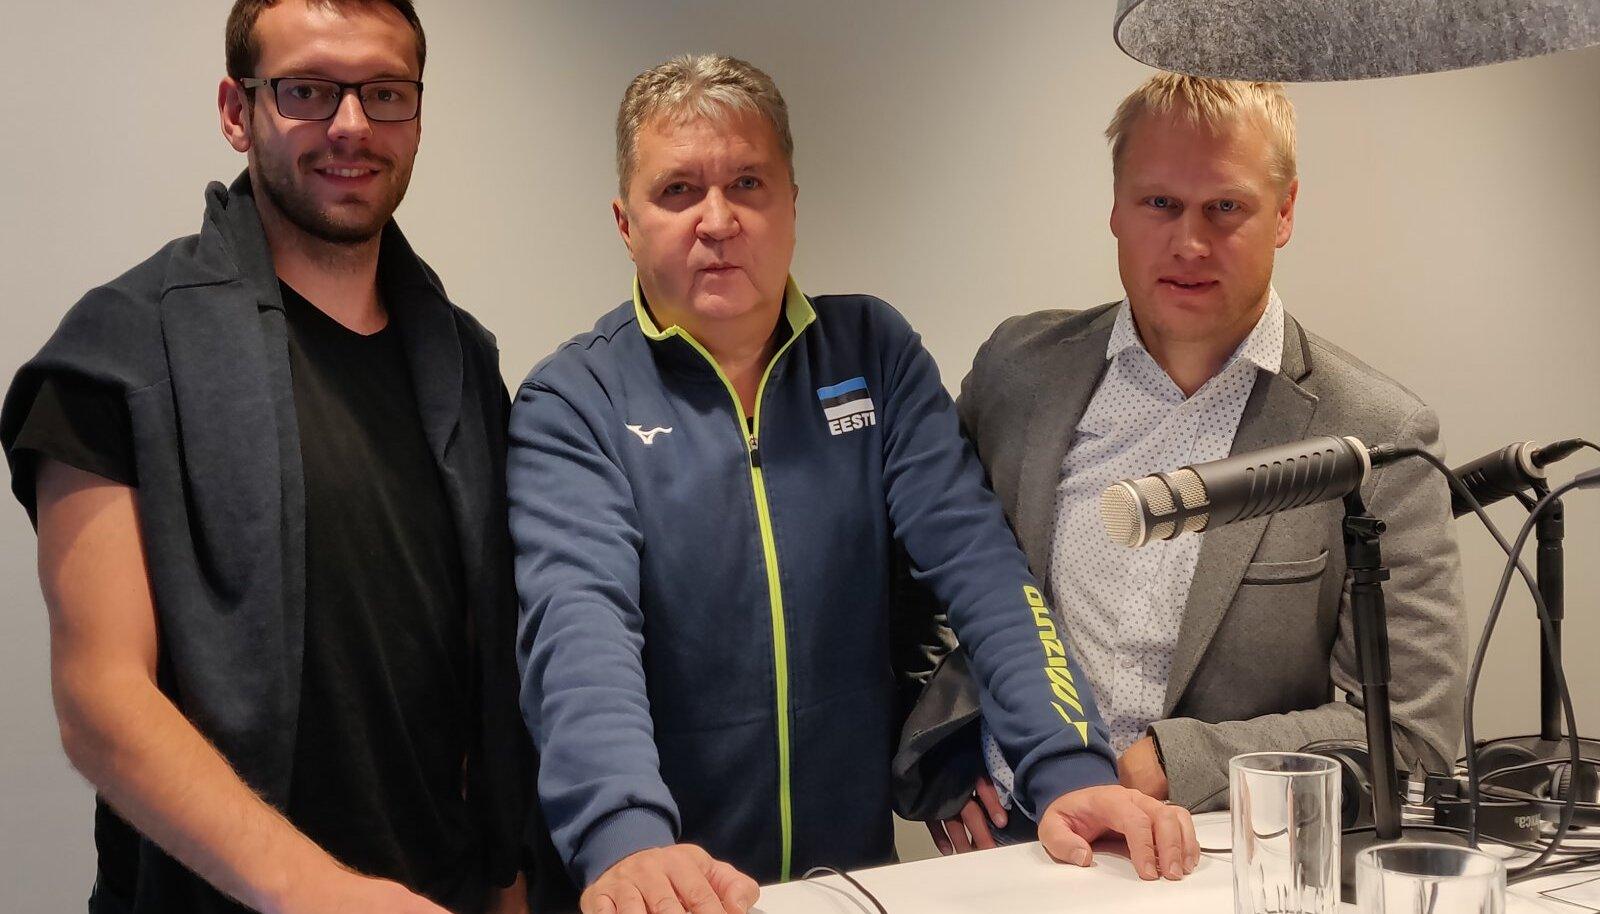 arl Rinaldo, Peeter Vahtra ja Sten Esna Manta maja stuudios.